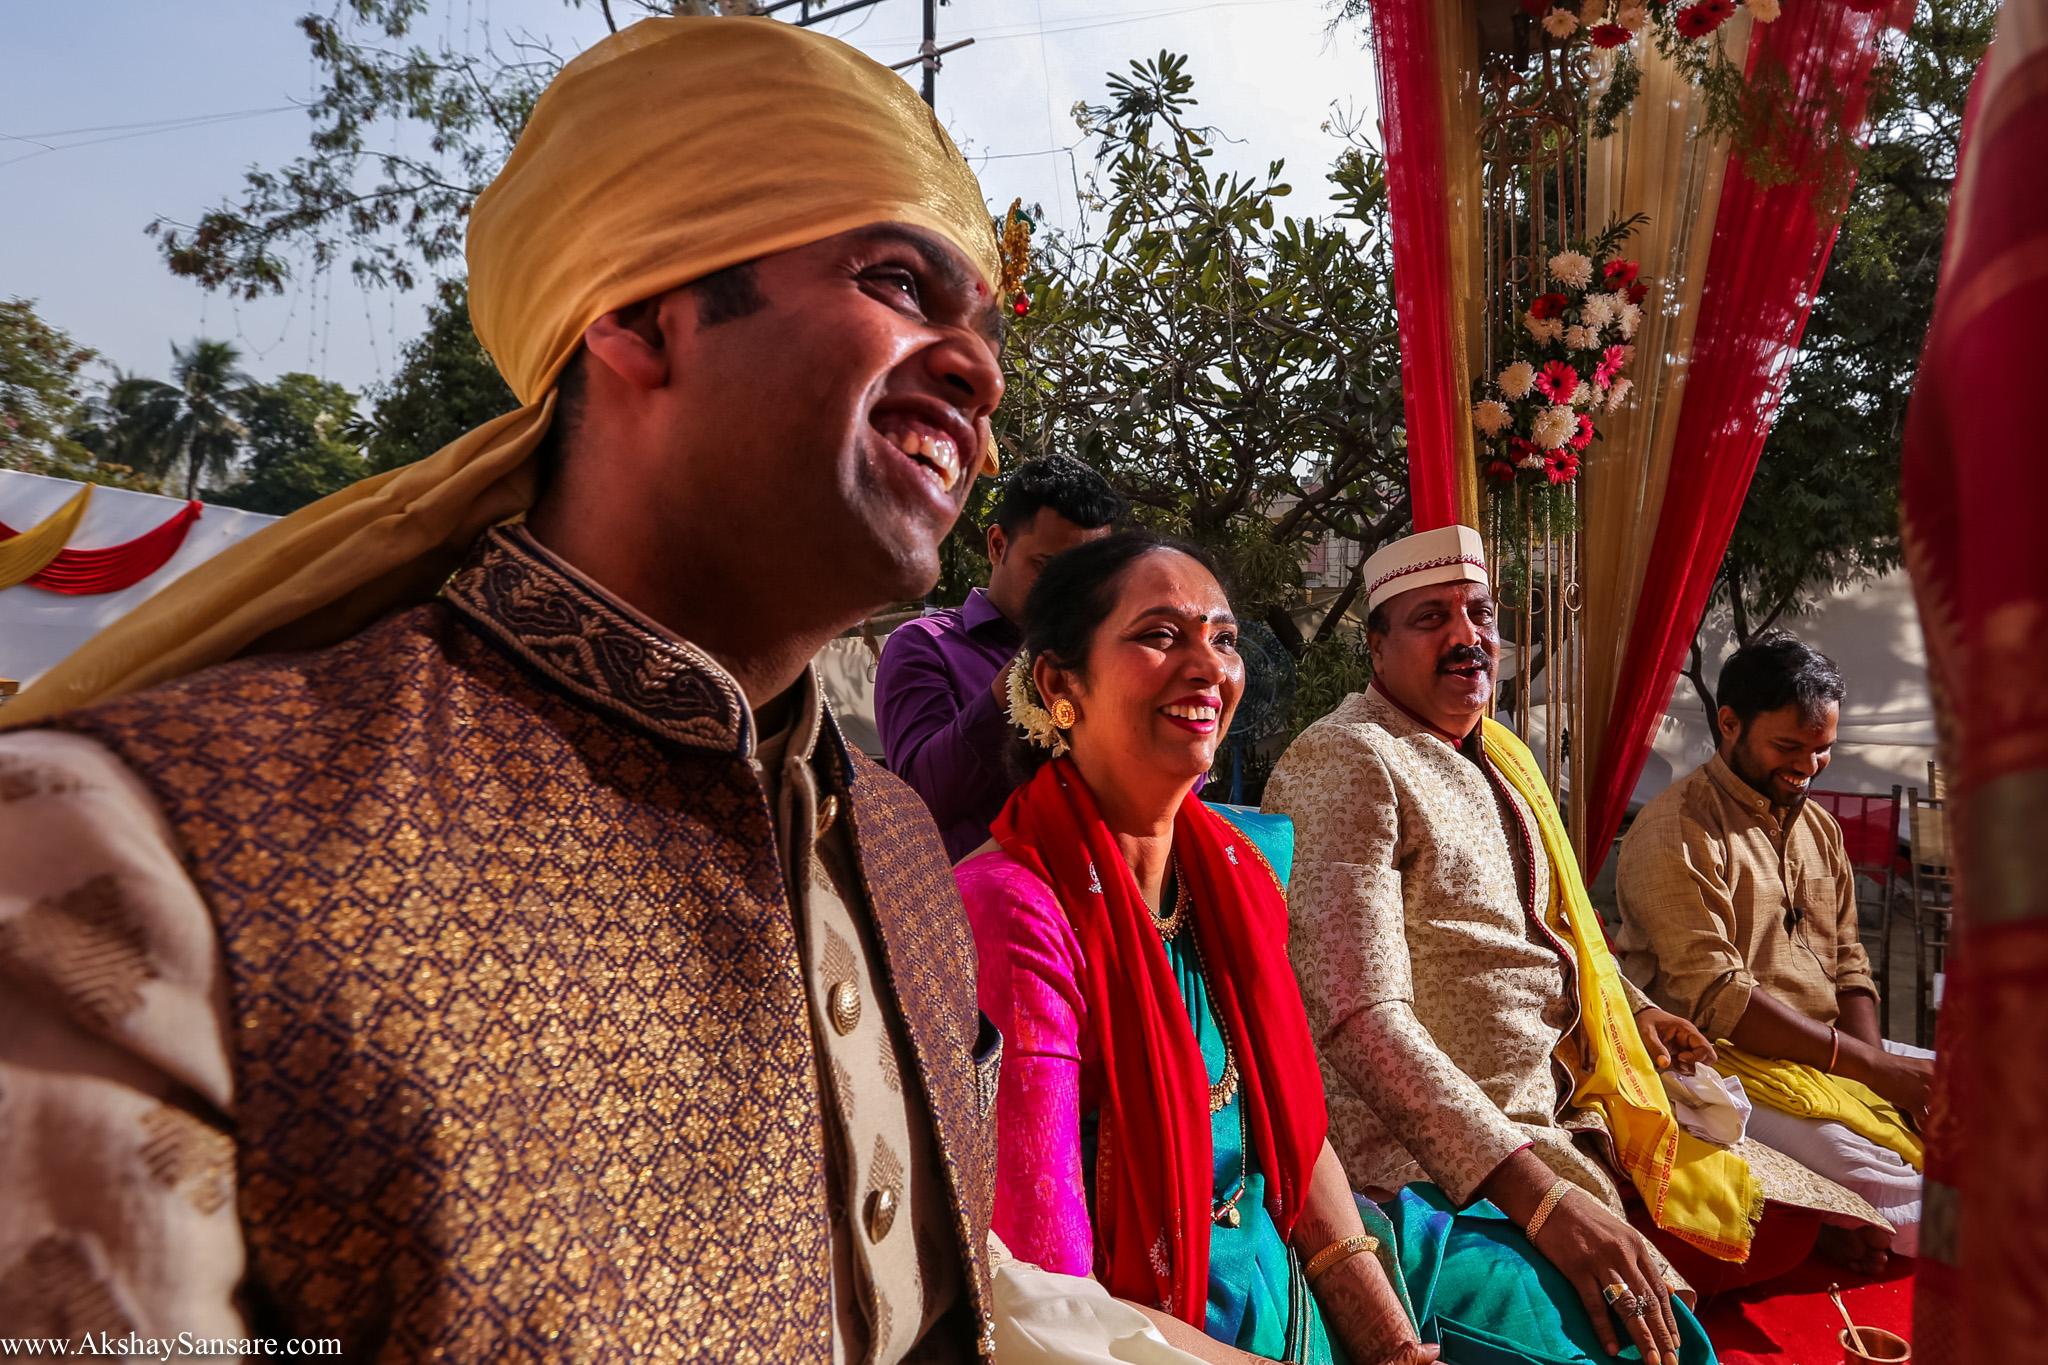 Salil x Kimaya Akshay Sansare Photography Candid wedding Photographer in mumbai best(15).jpg